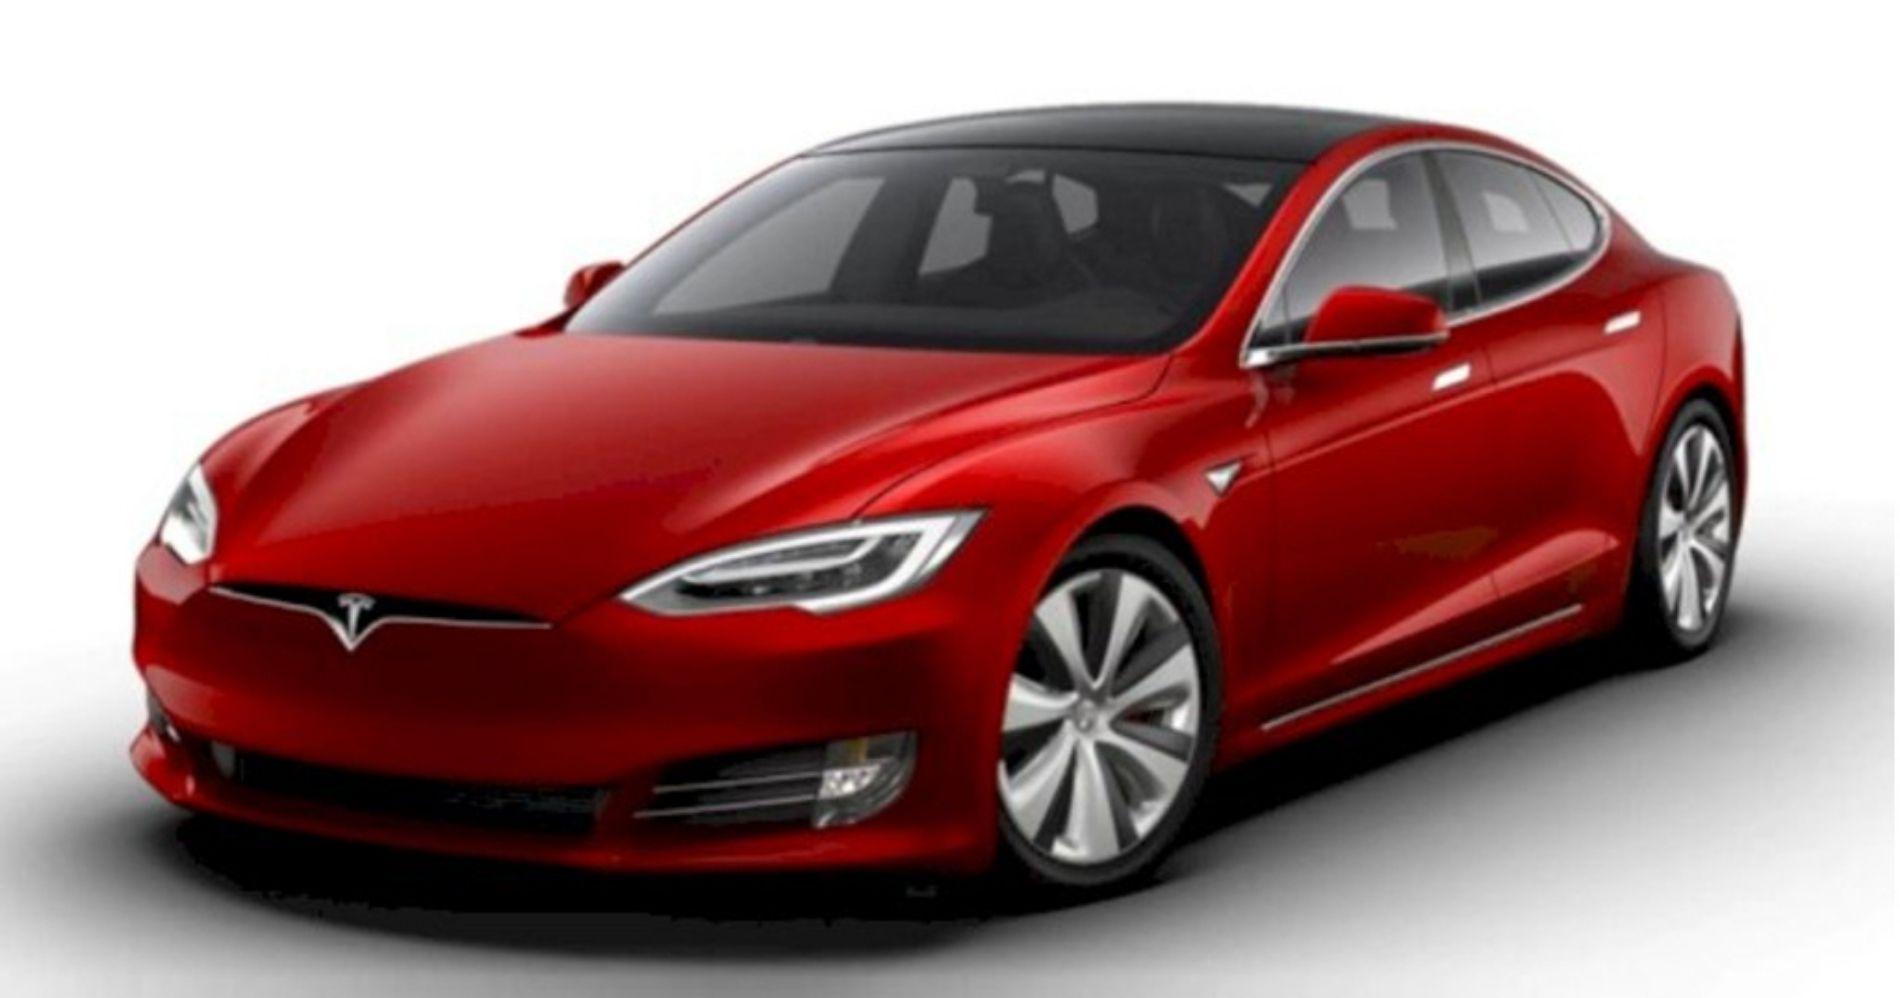 Tesla Model S Plaid Illustration Web Bisnis Muda - Image: Tesla